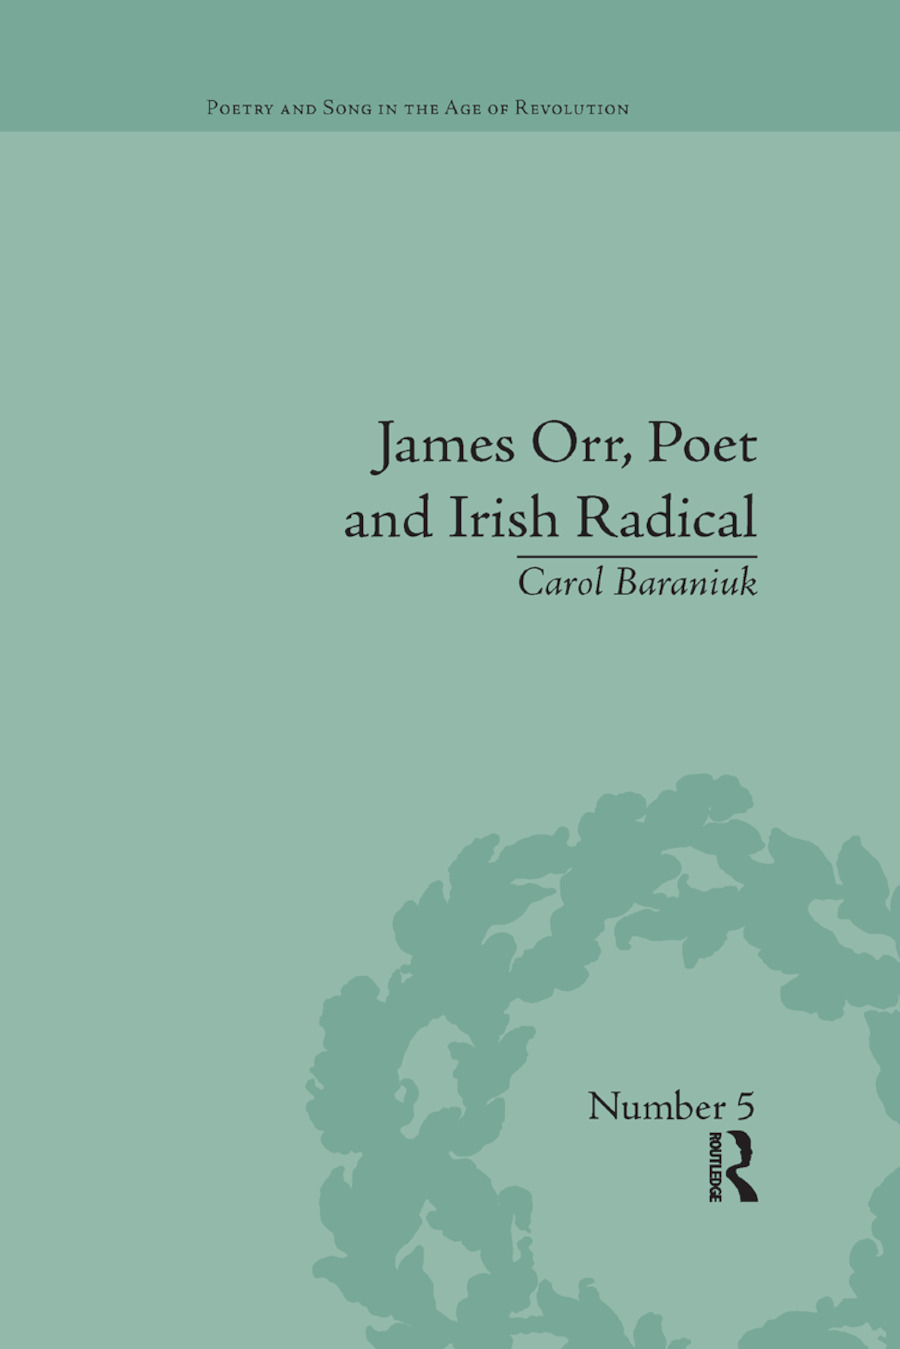 James Orr, Poet and Irish Radical